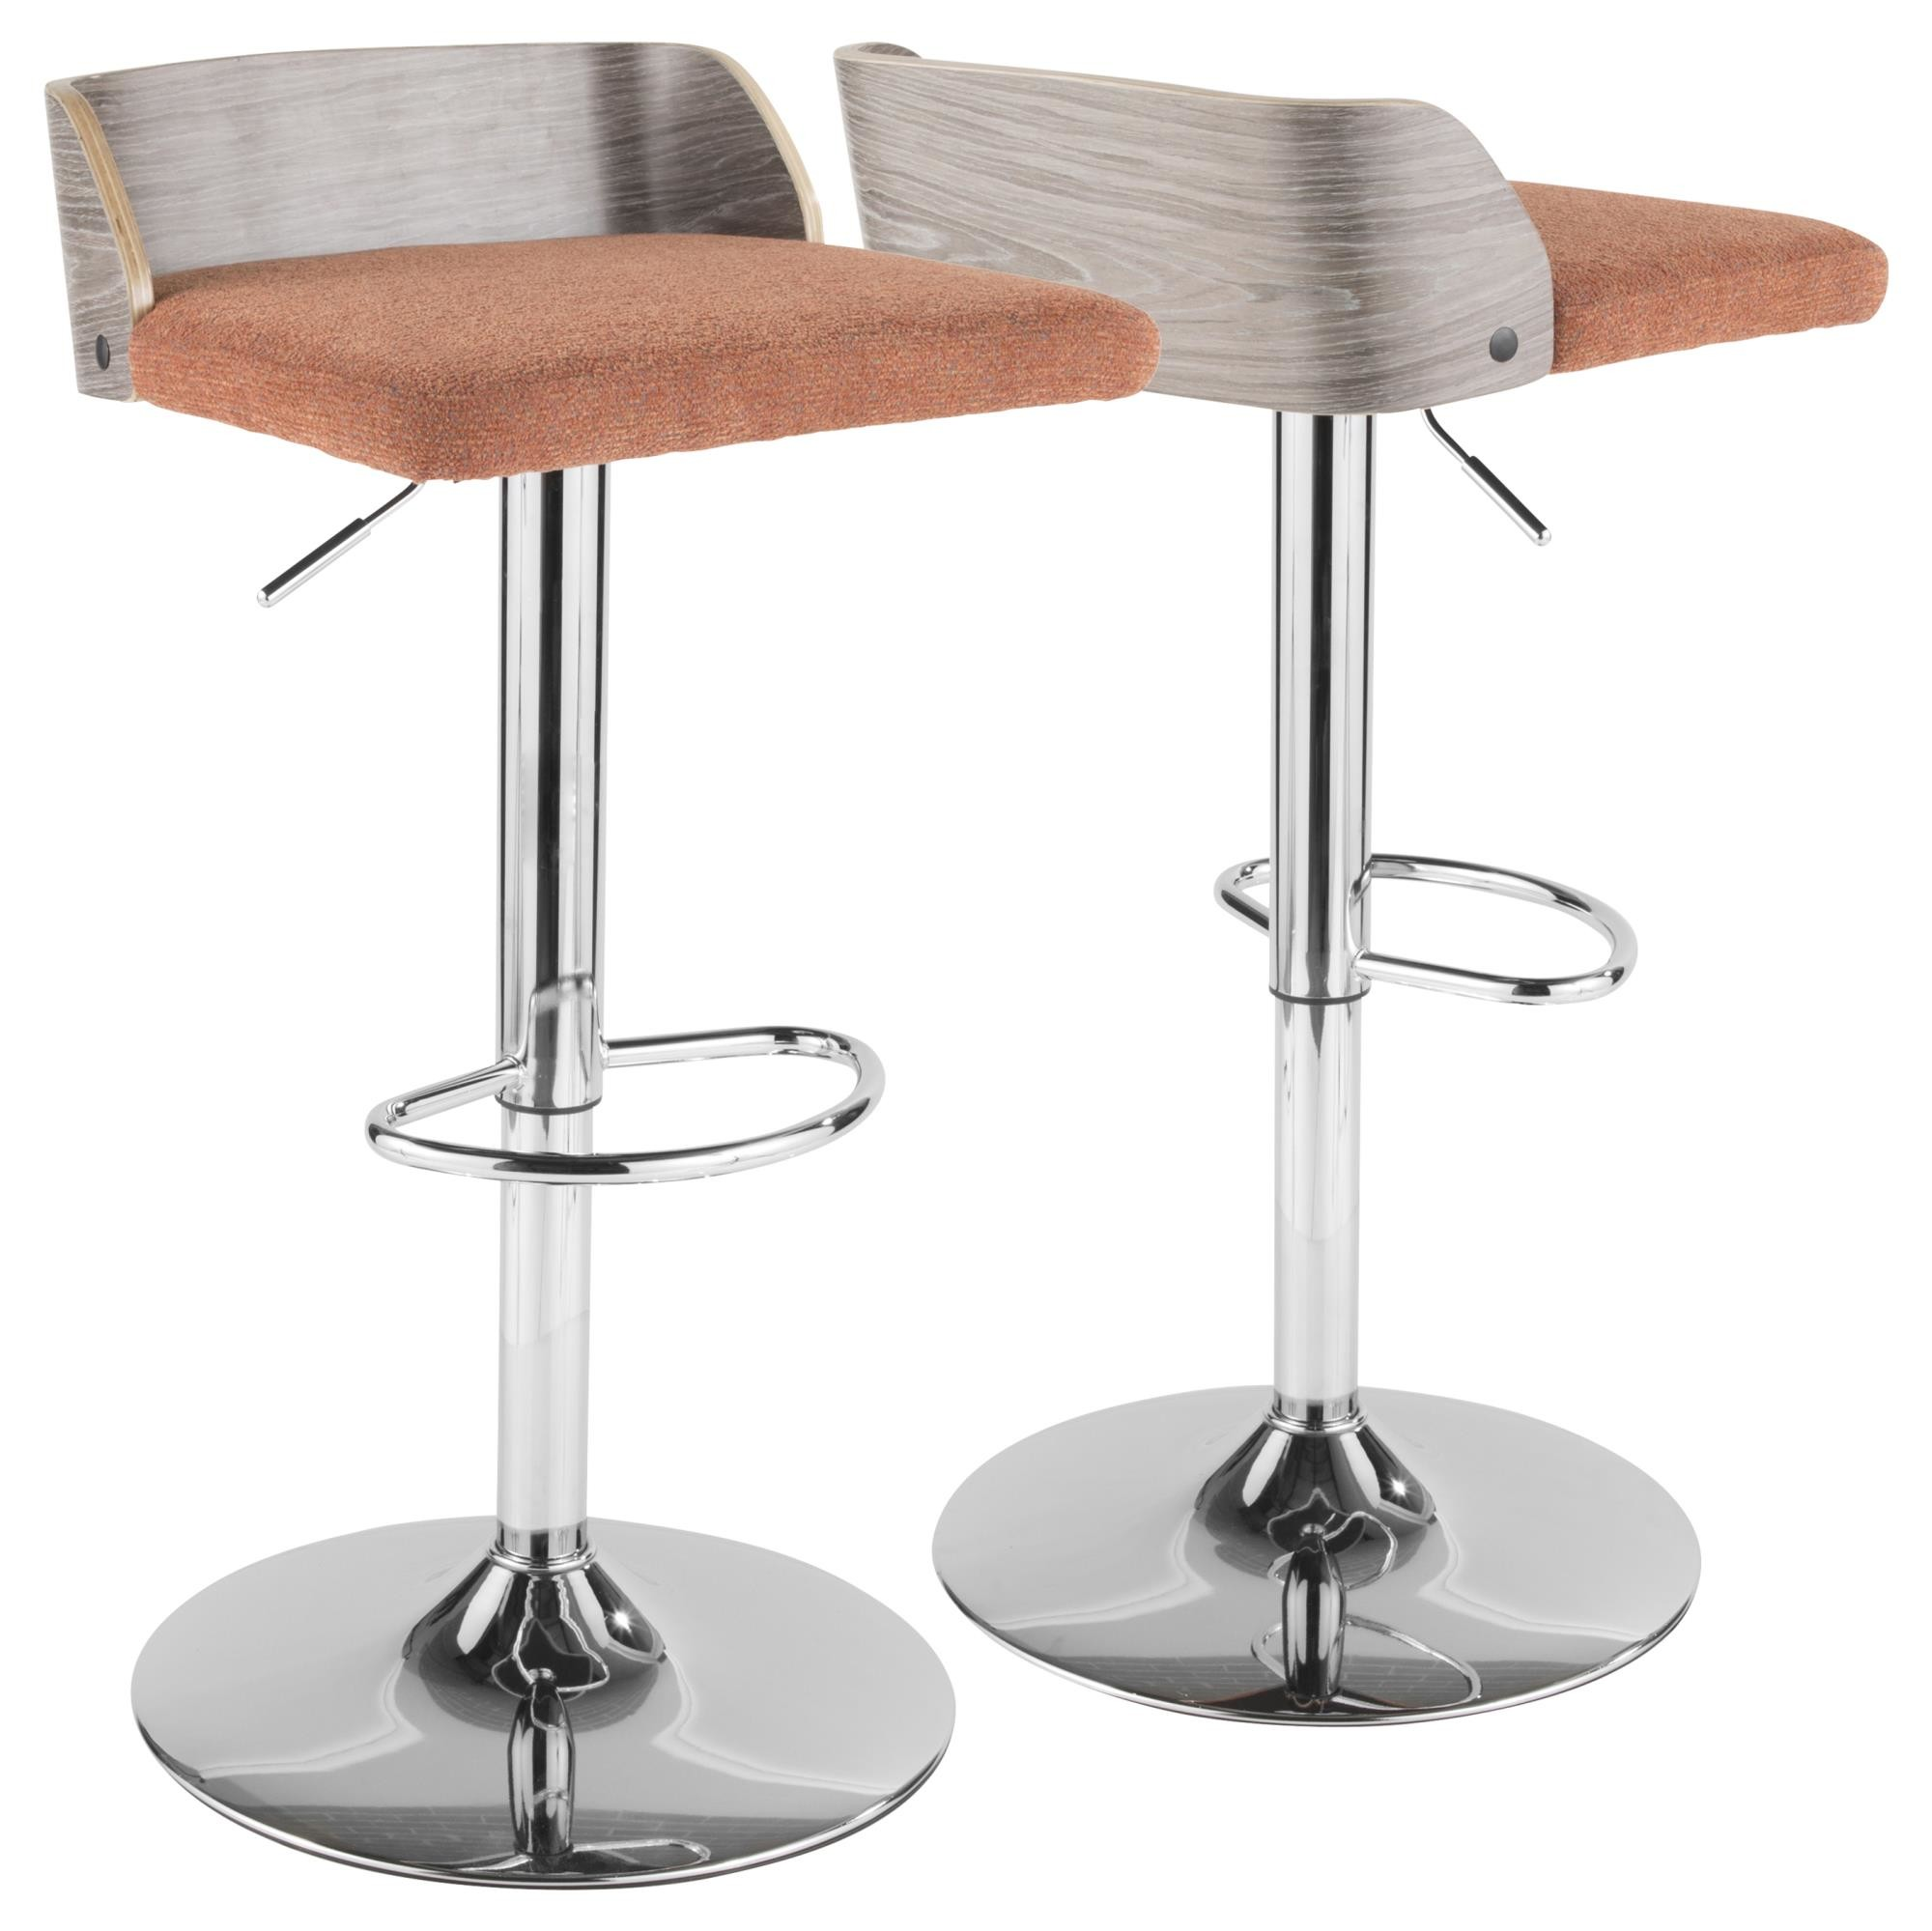 Swell Maya Barstool Lumisource Stylish Decor At Affordable Prices Evergreenethics Interior Chair Design Evergreenethicsorg